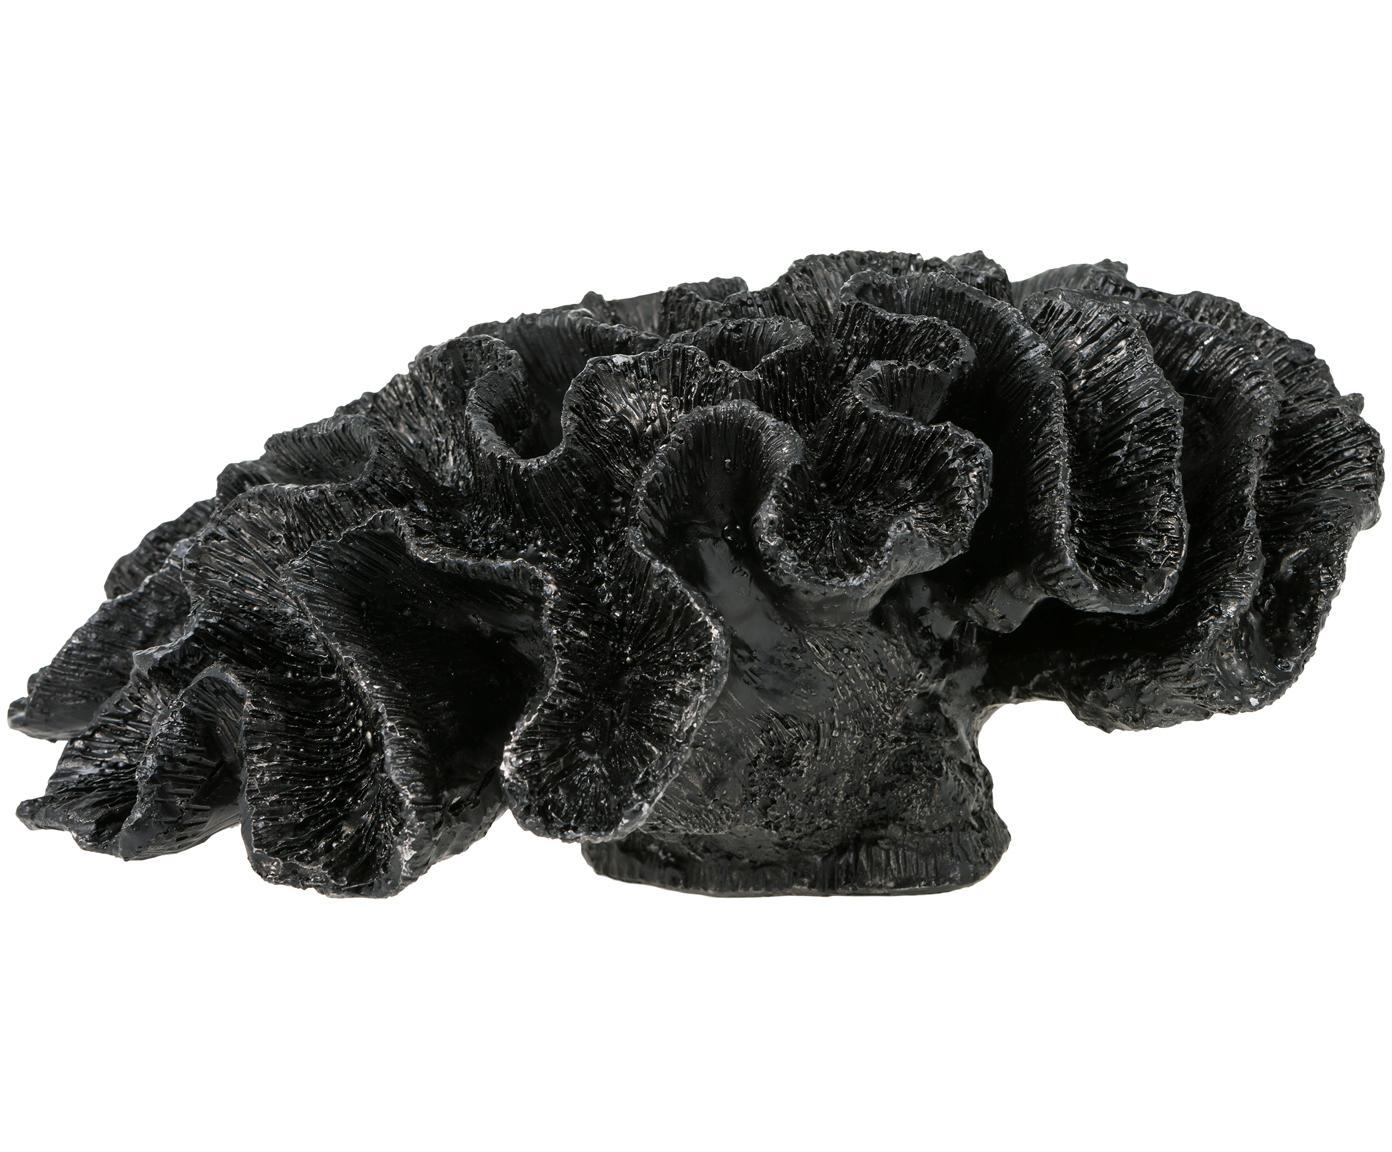 Deko-Objekt Marina, Polyresin, Schwarz, 24 x 12 cm